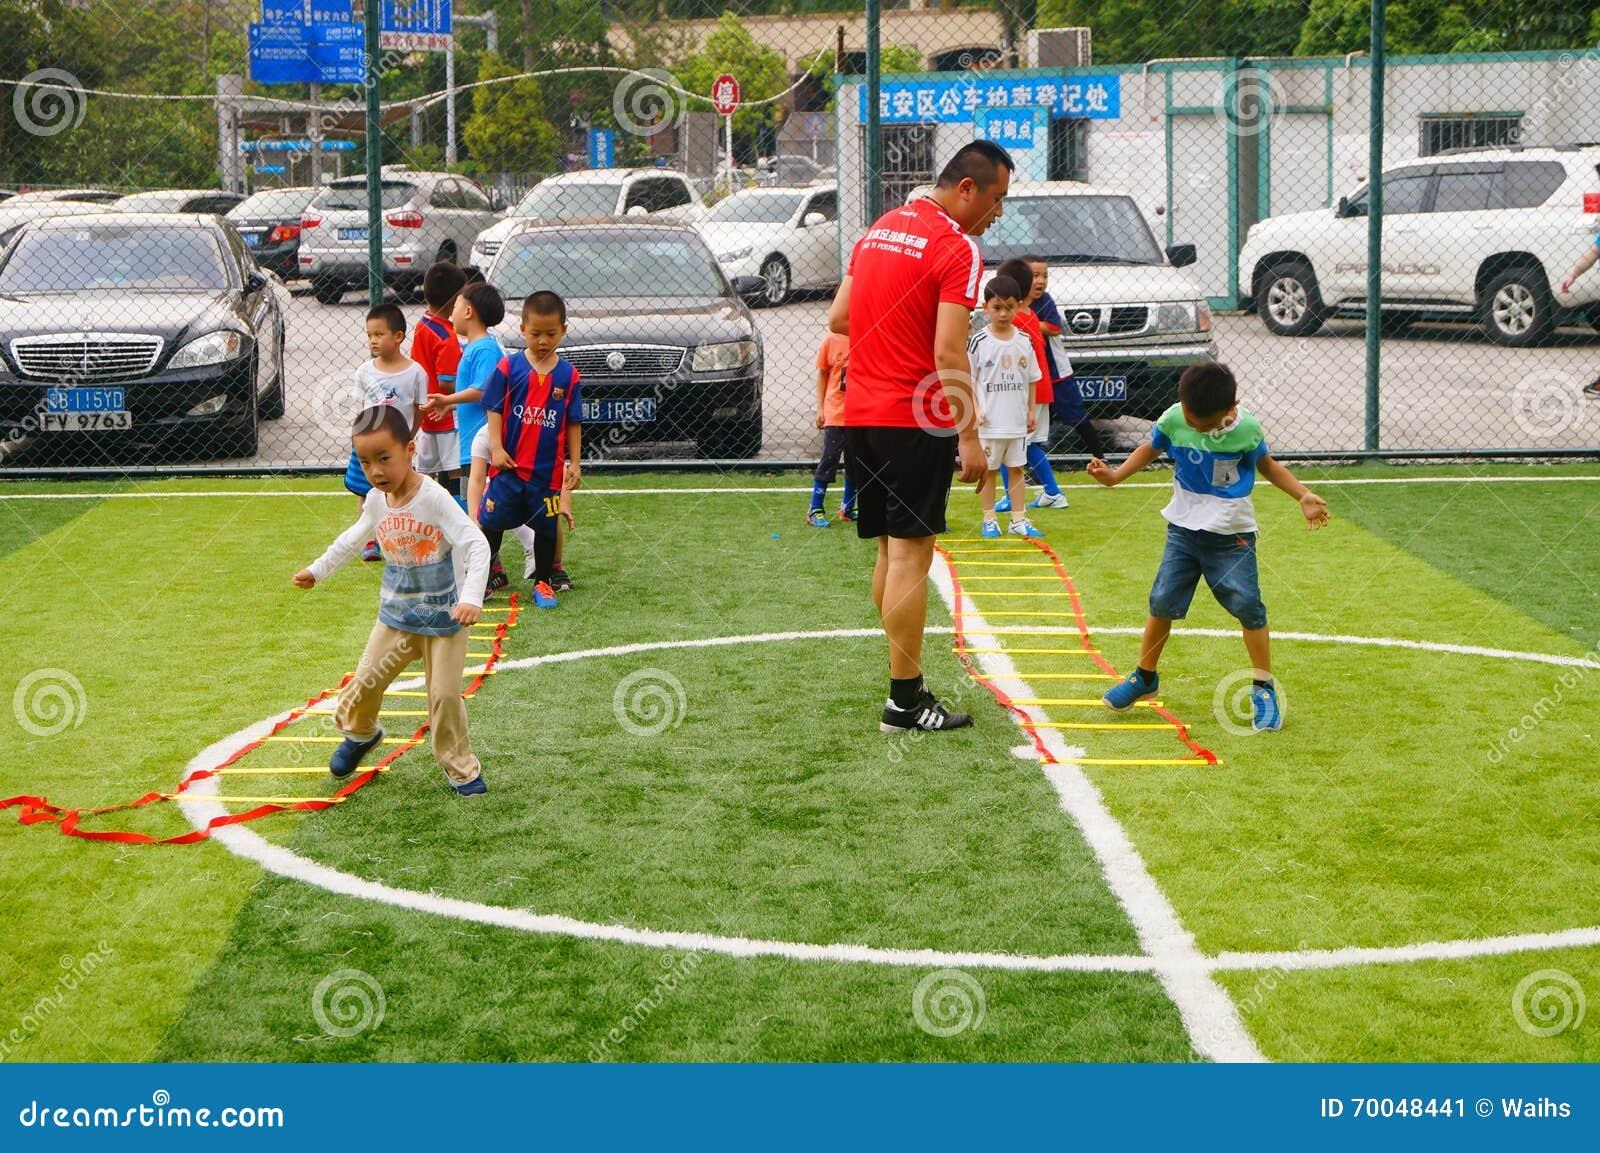 4 Ways Coaches Can Teach the Fundamentals of Softball